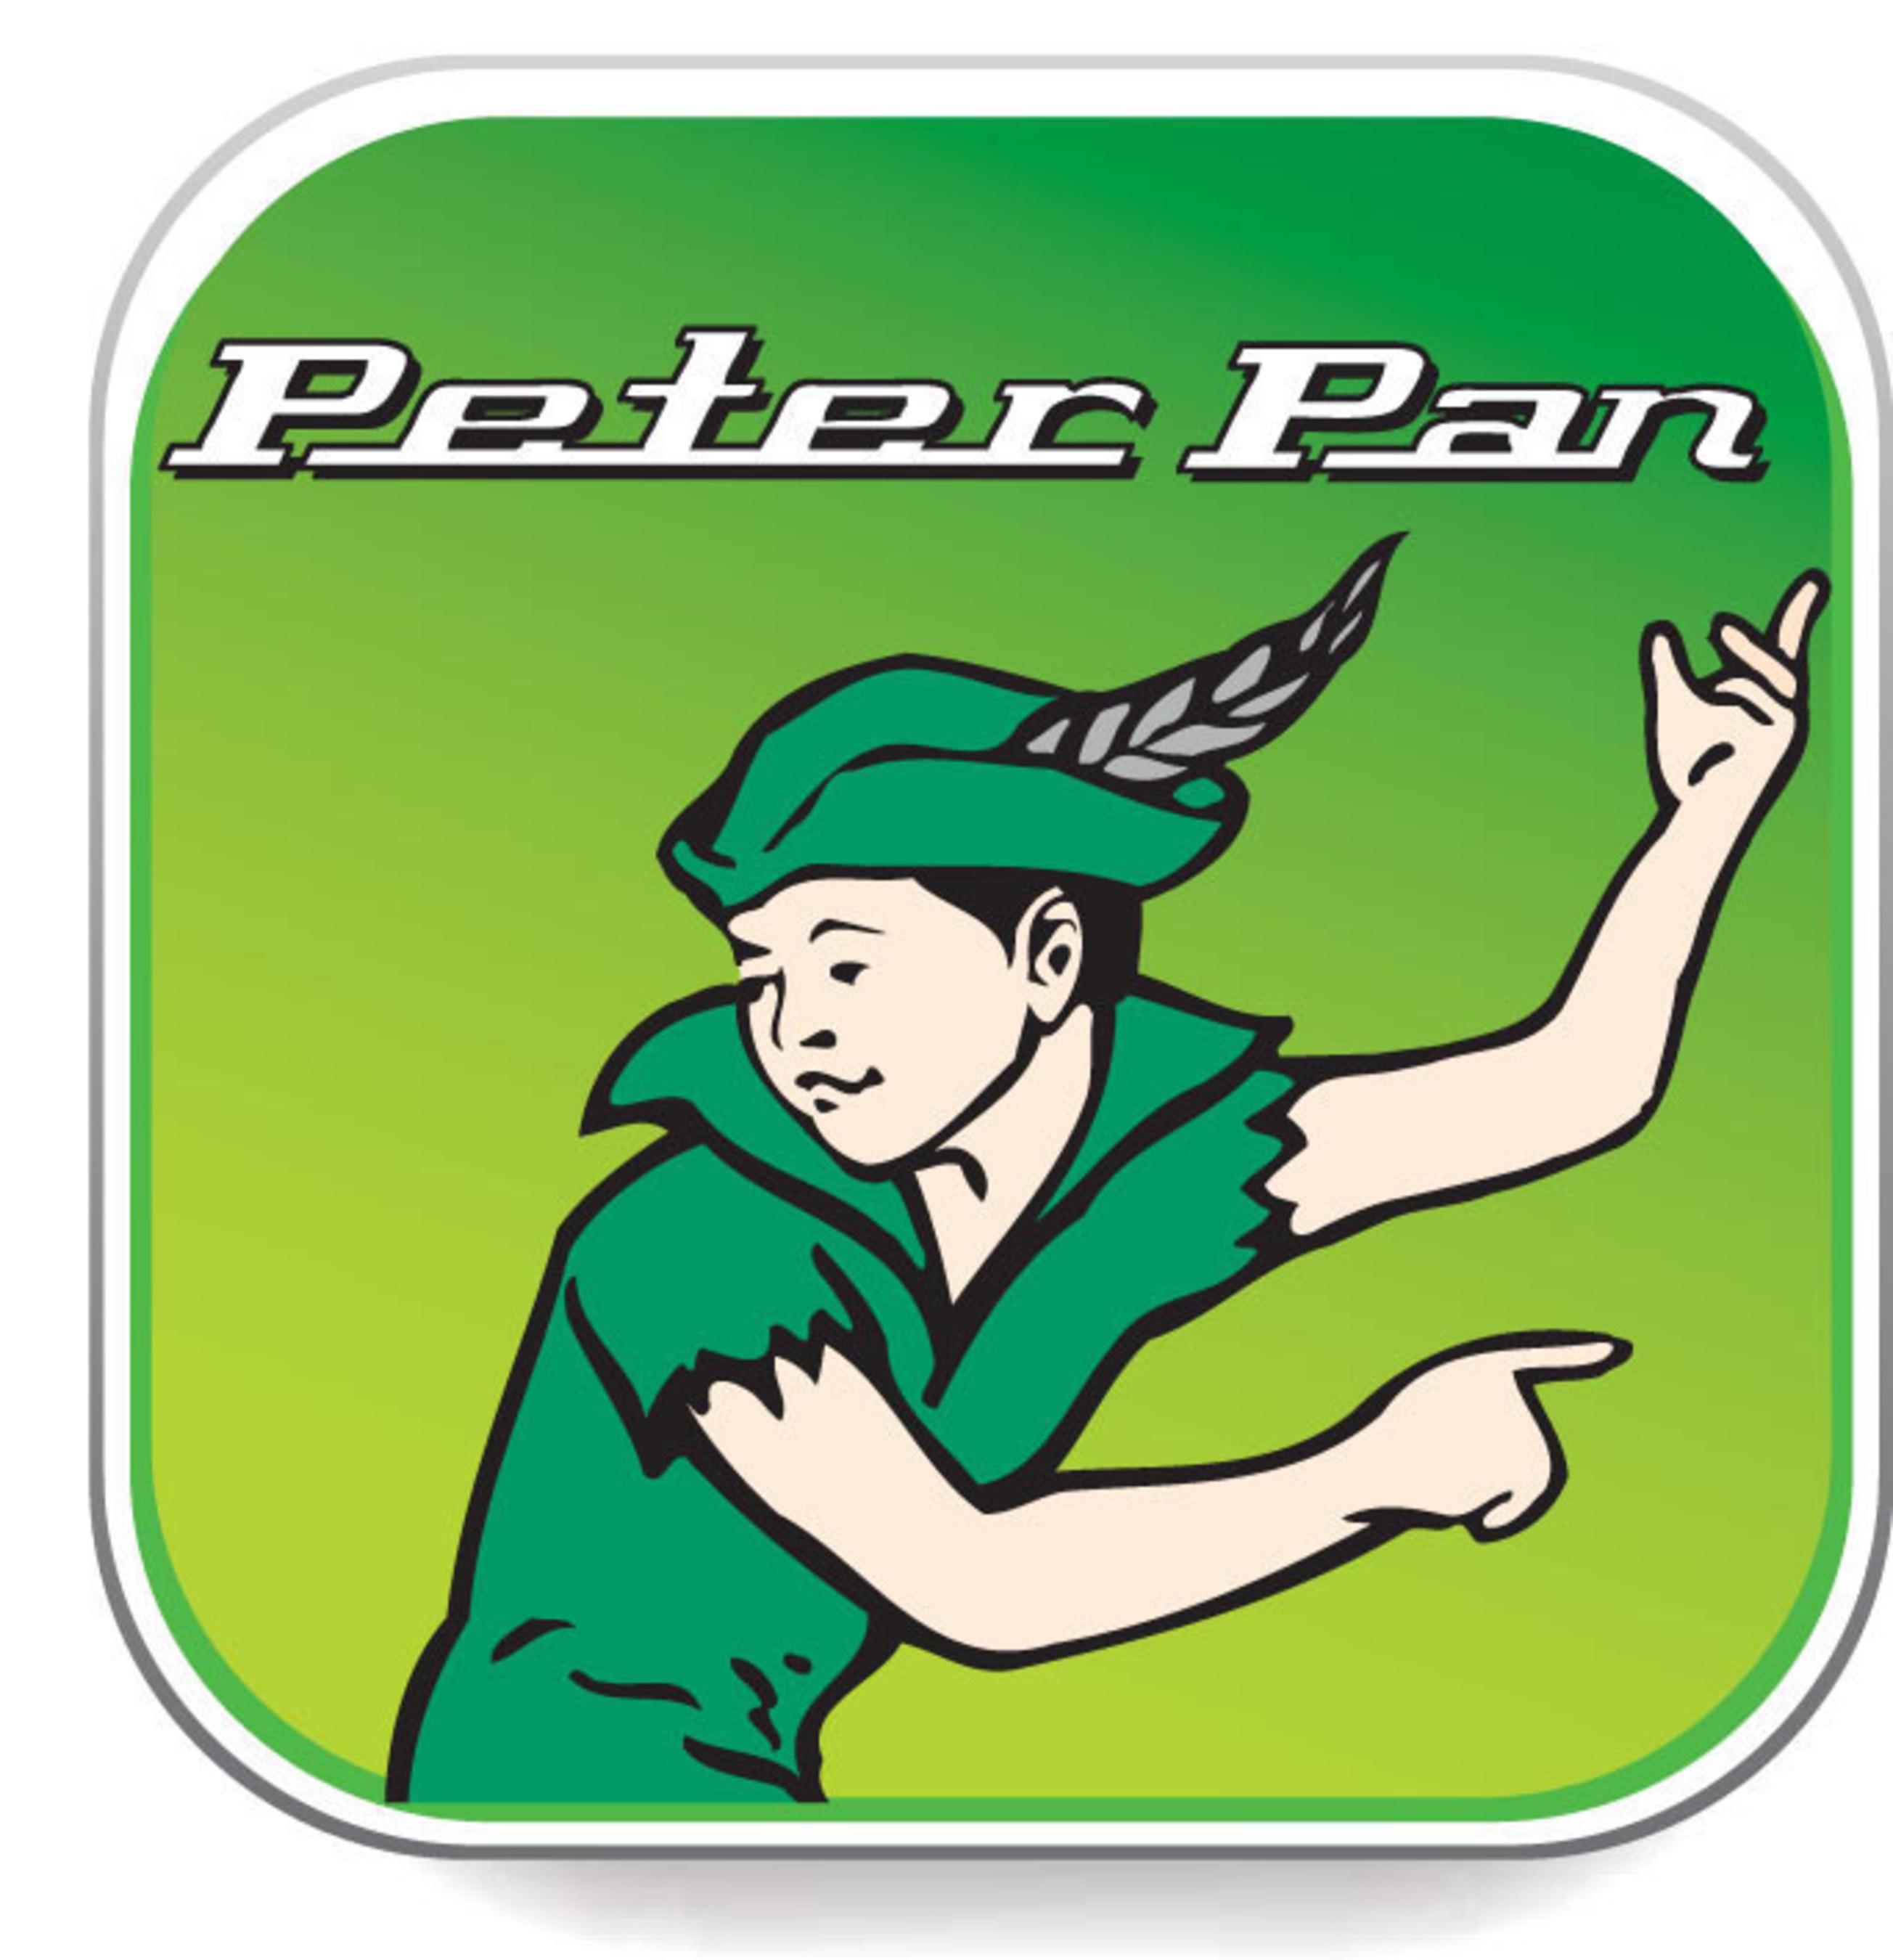 Peter Pan Bus Lines Celebrates Hyannis to Boston Anniversary